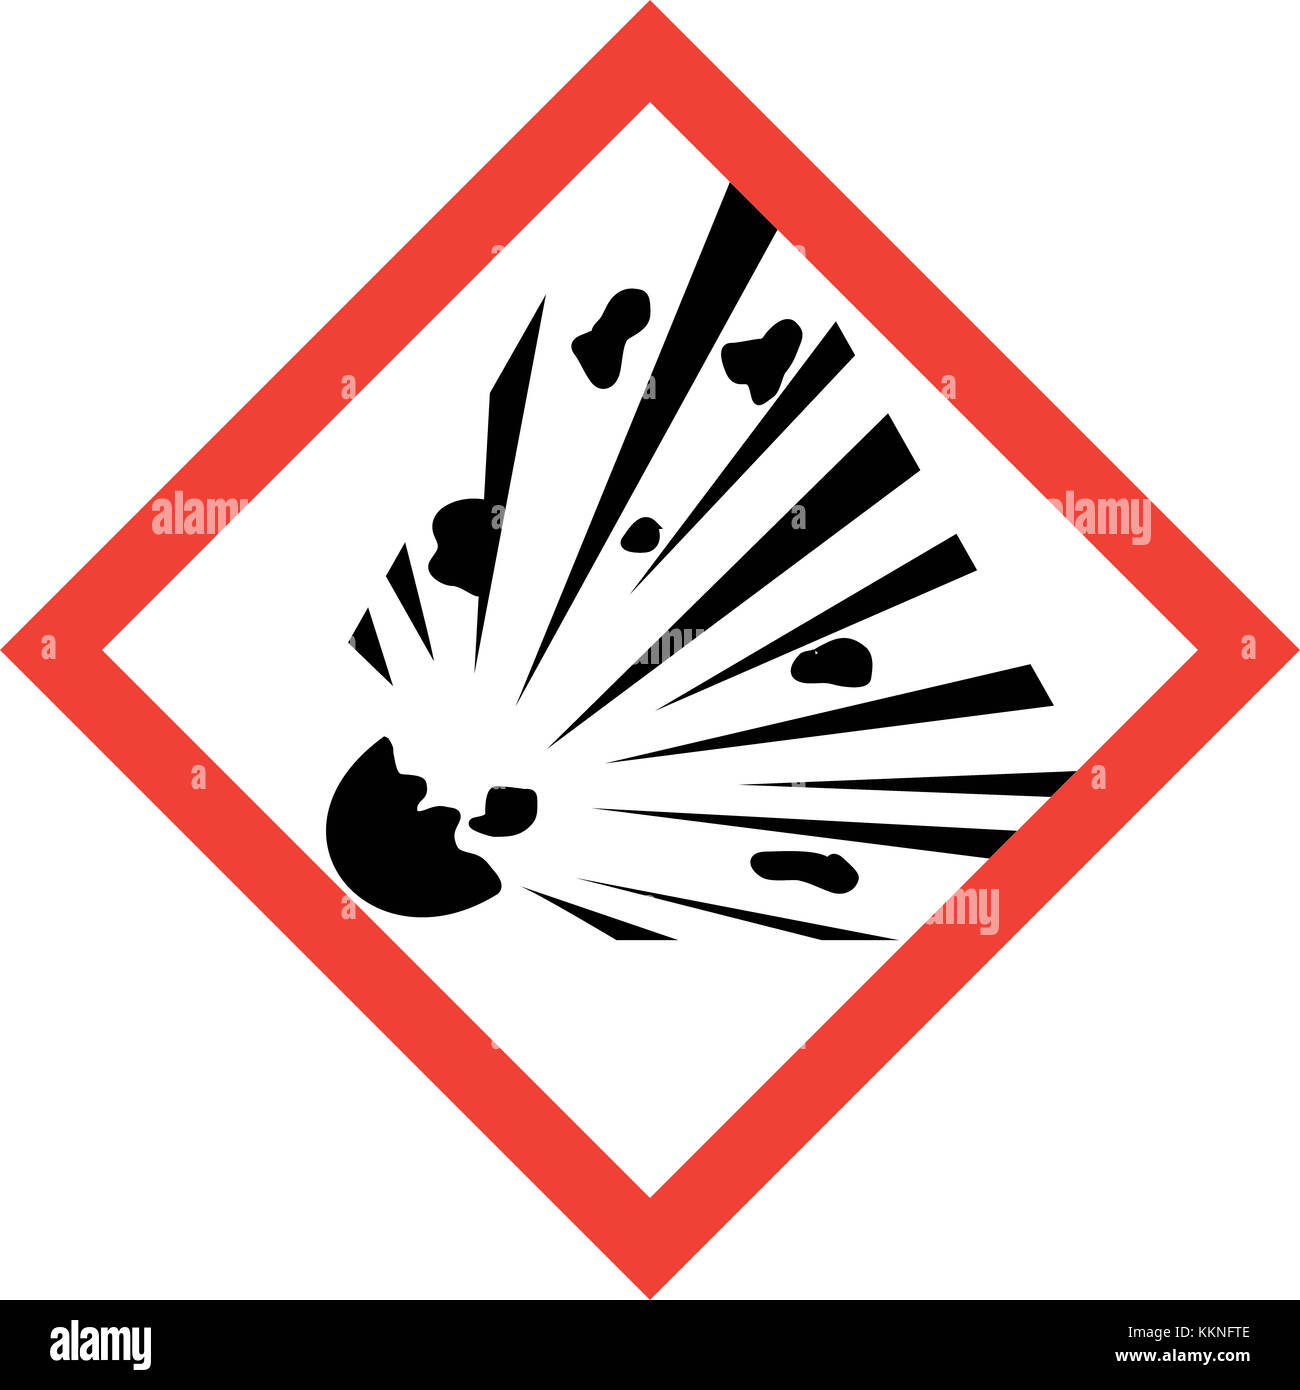 explosive warning label stock photos amp explosive warning